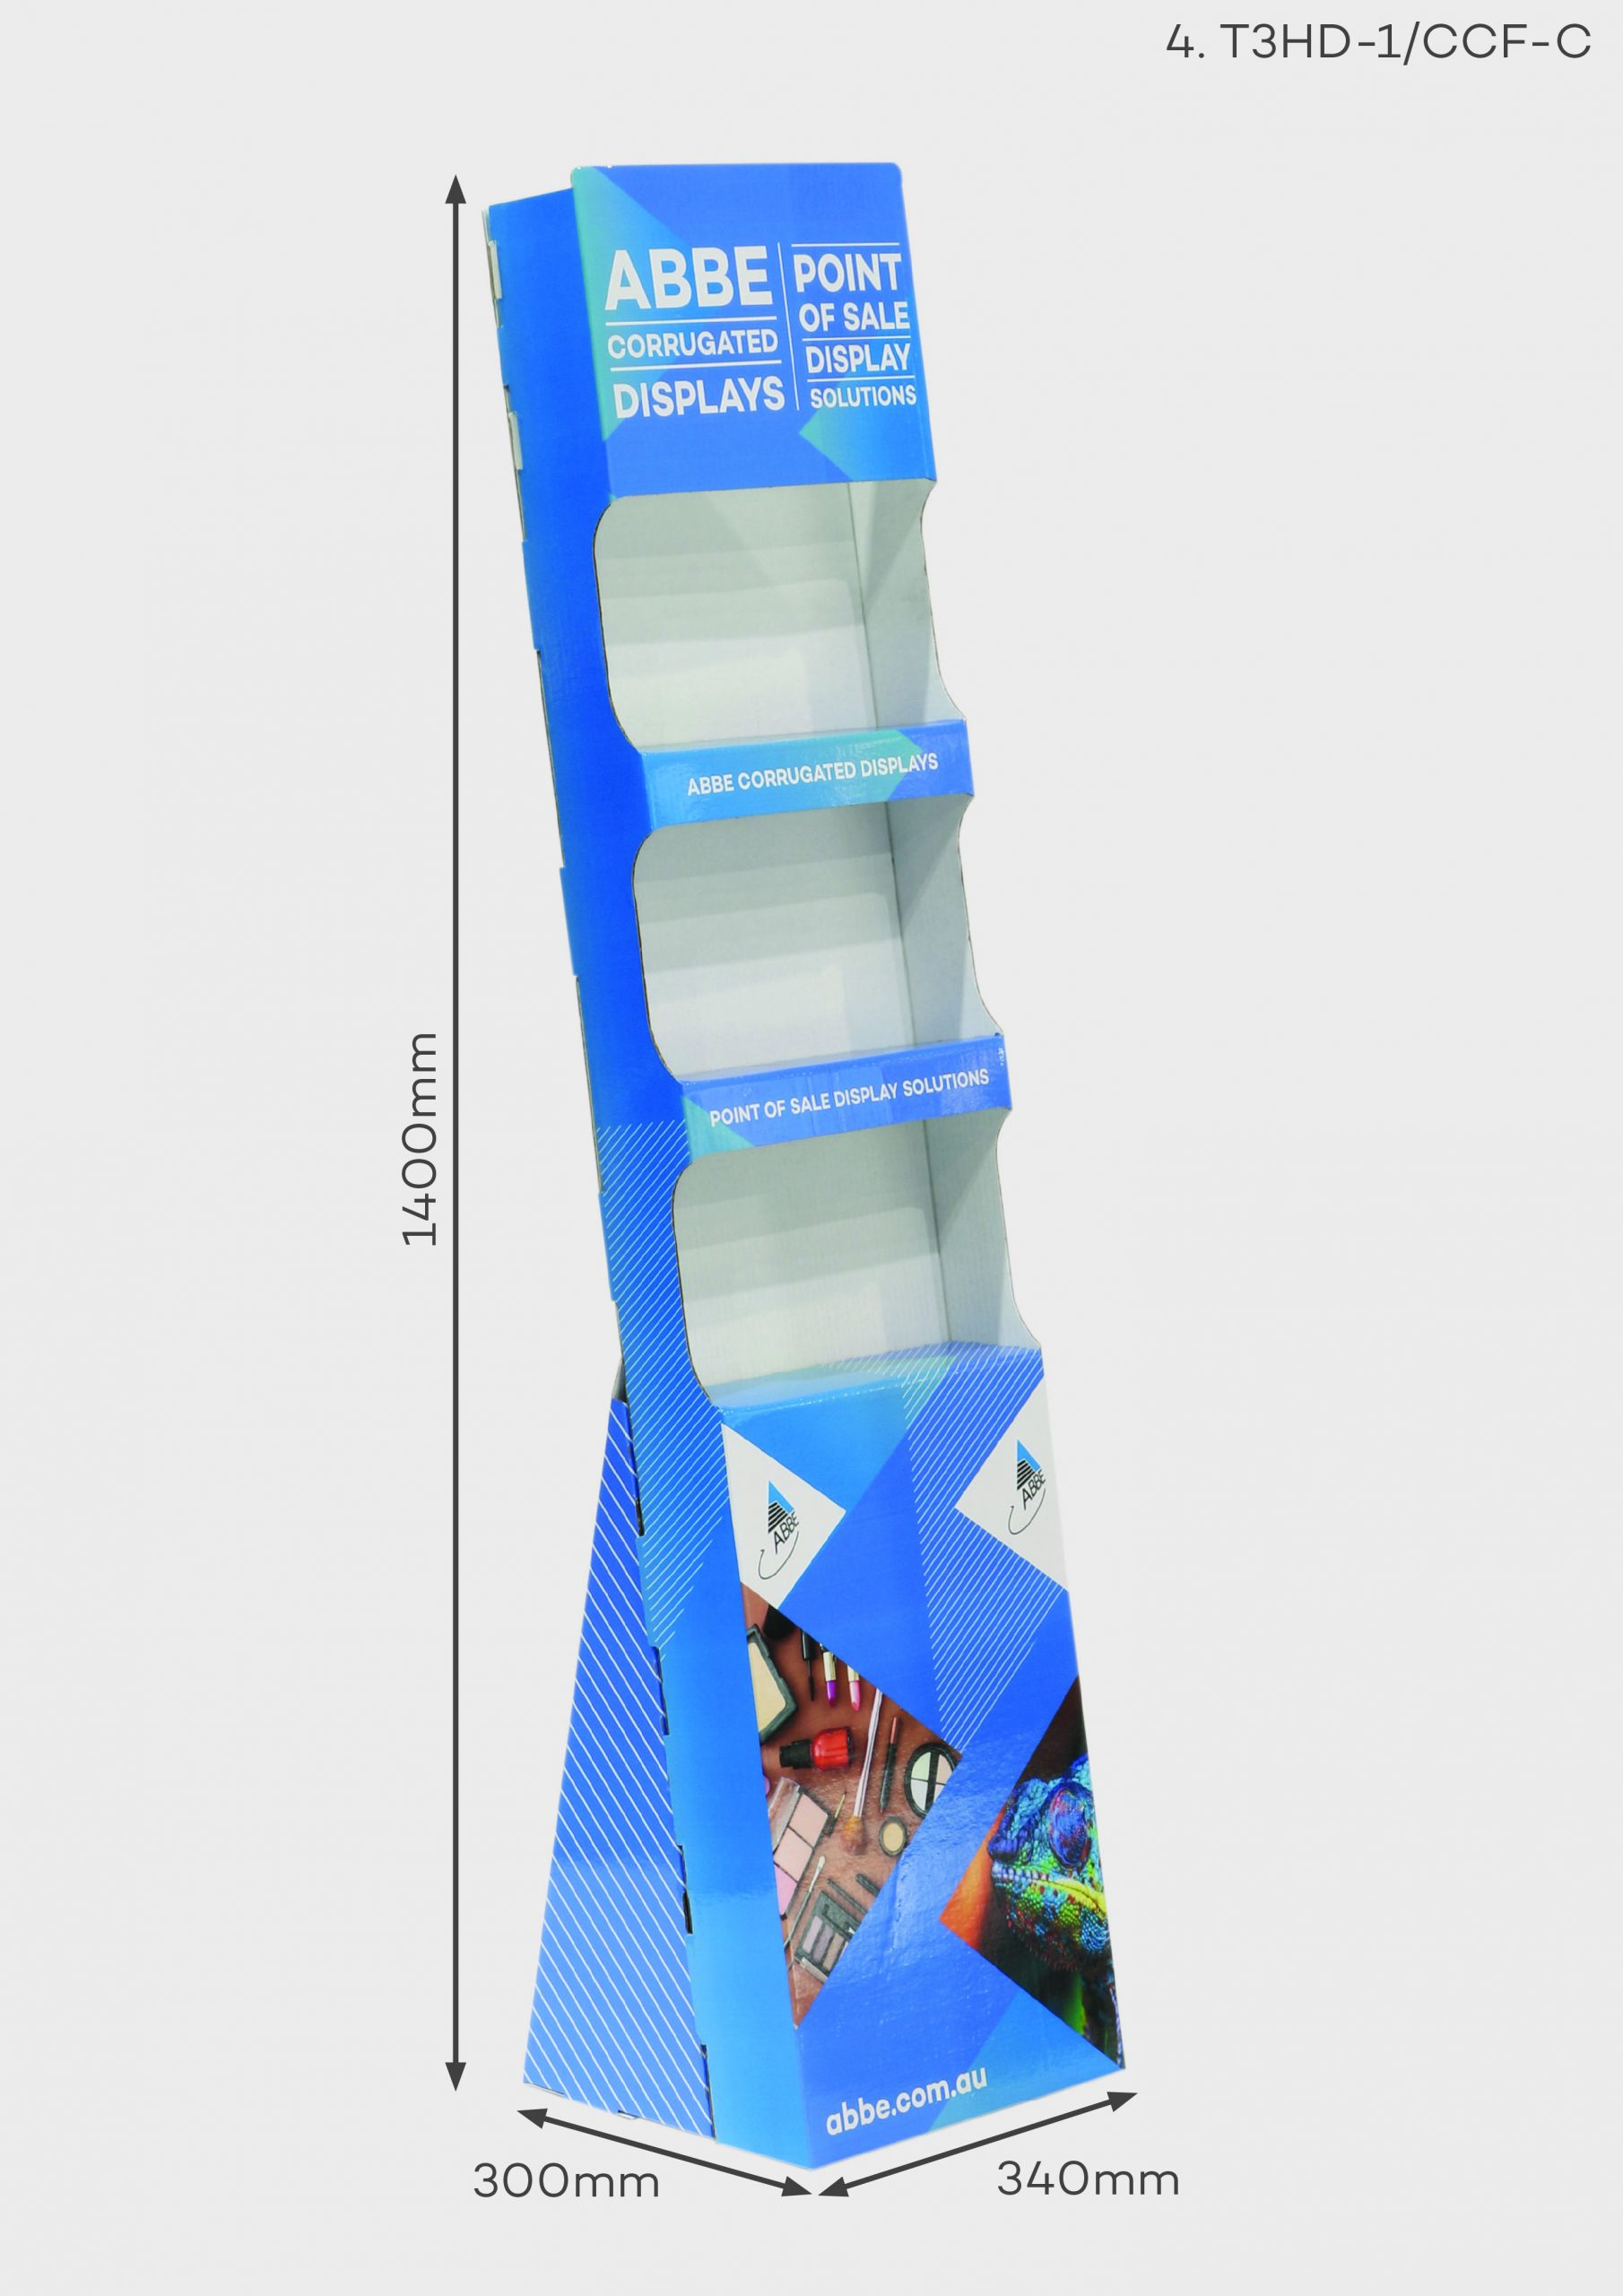 3 Shelf Display (Ref T3HD-1/CCF-C)